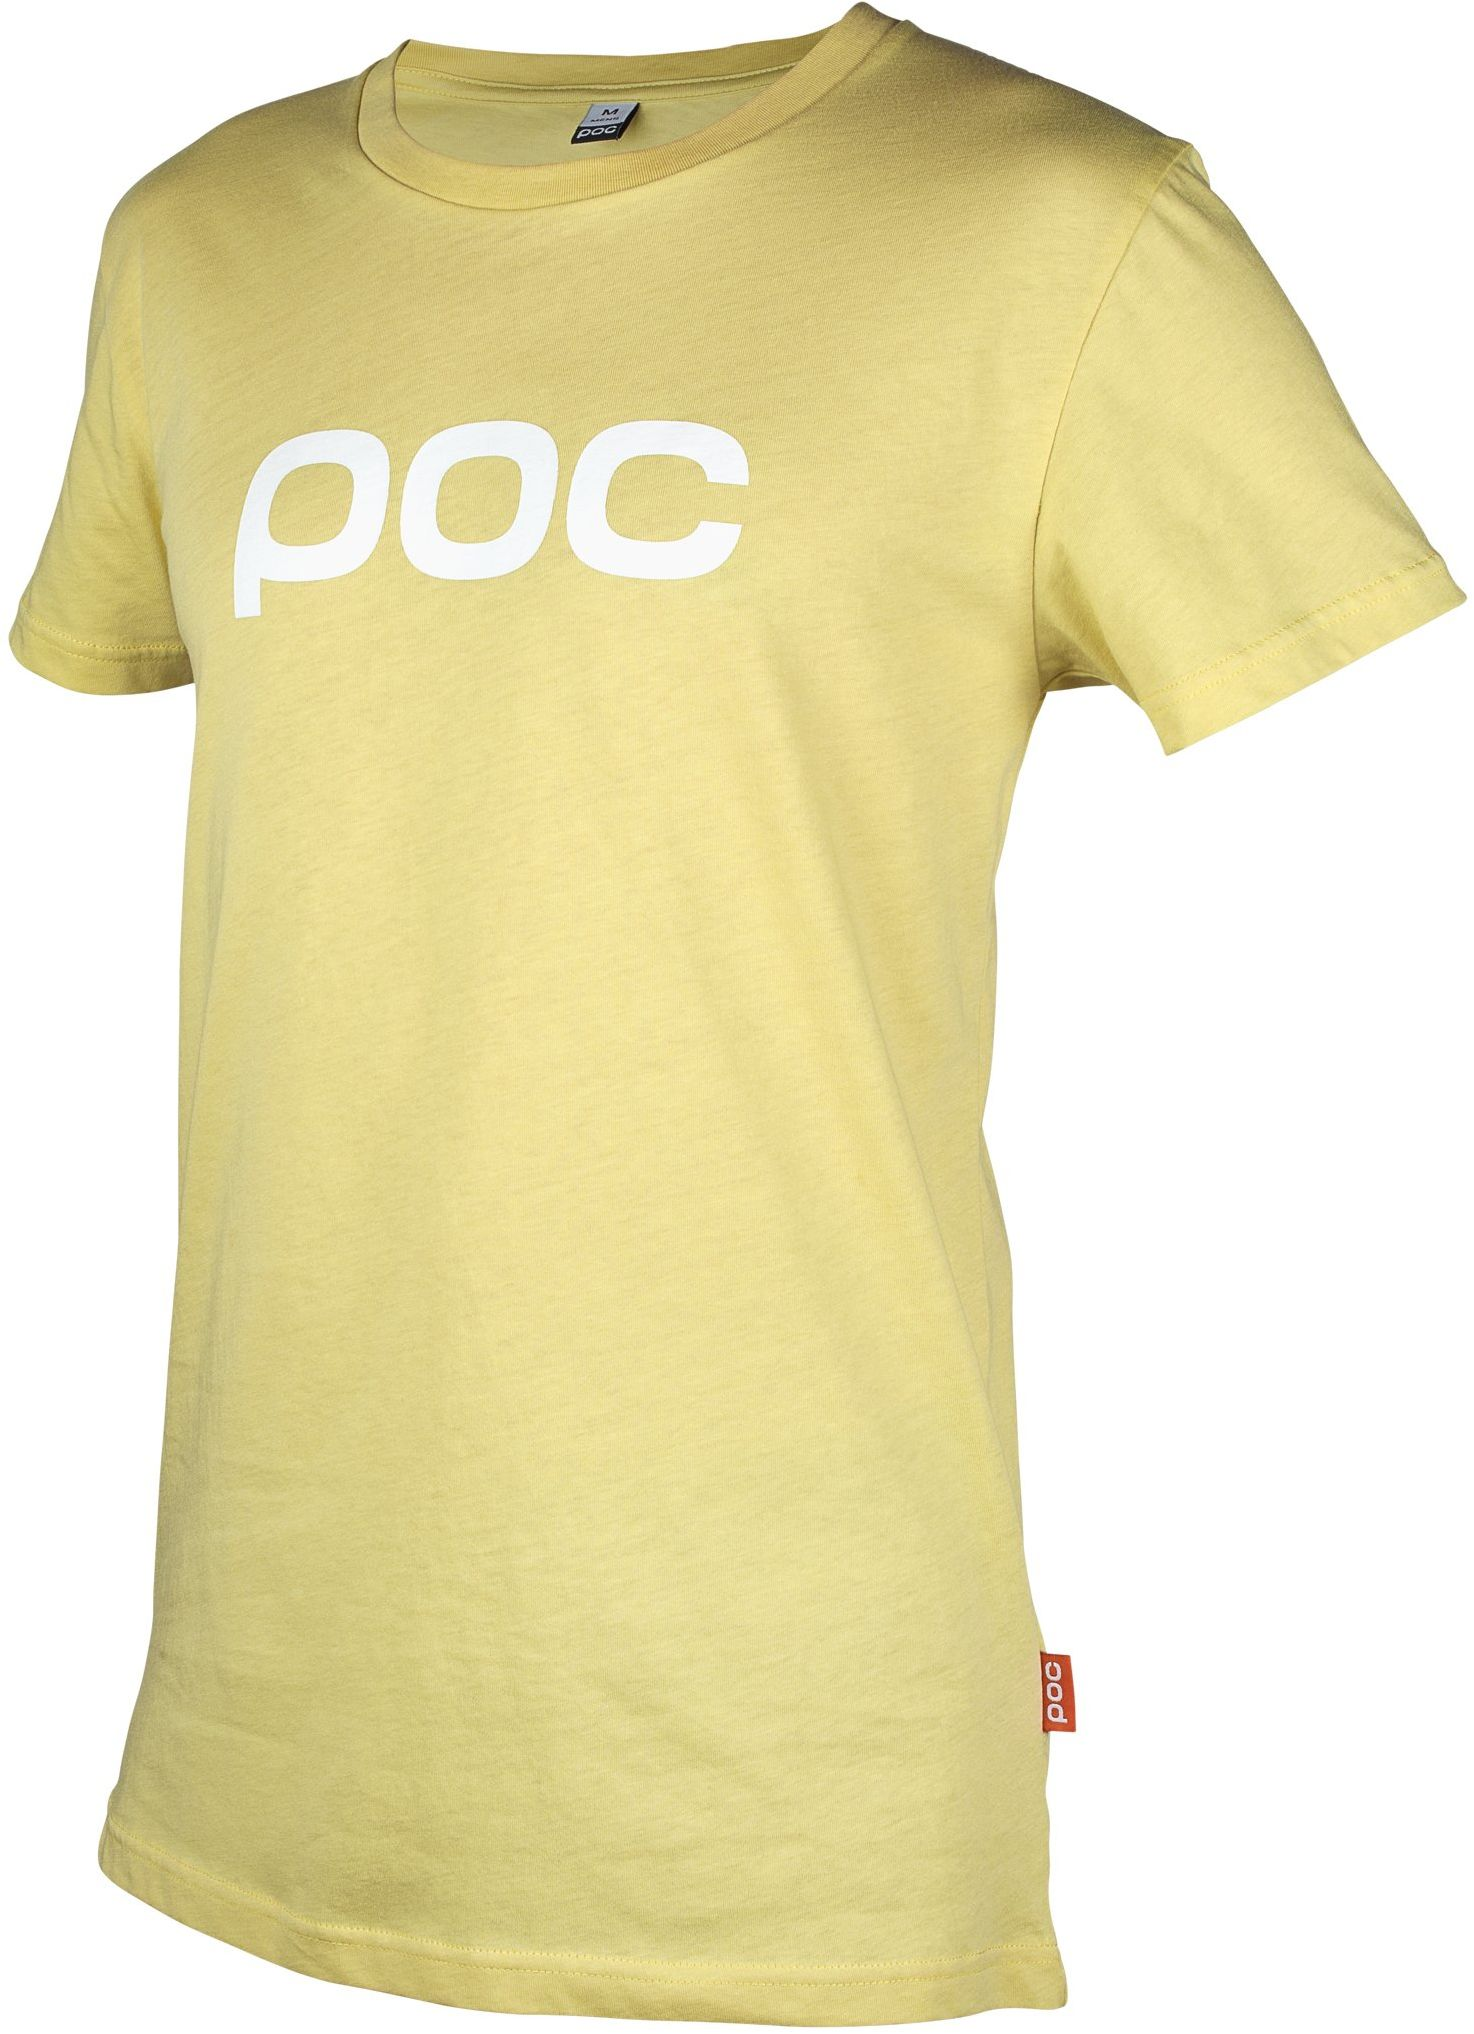 POC Męska koszulka kolarska z kręgosłupem żółta żelazna żółta rozmiar: S